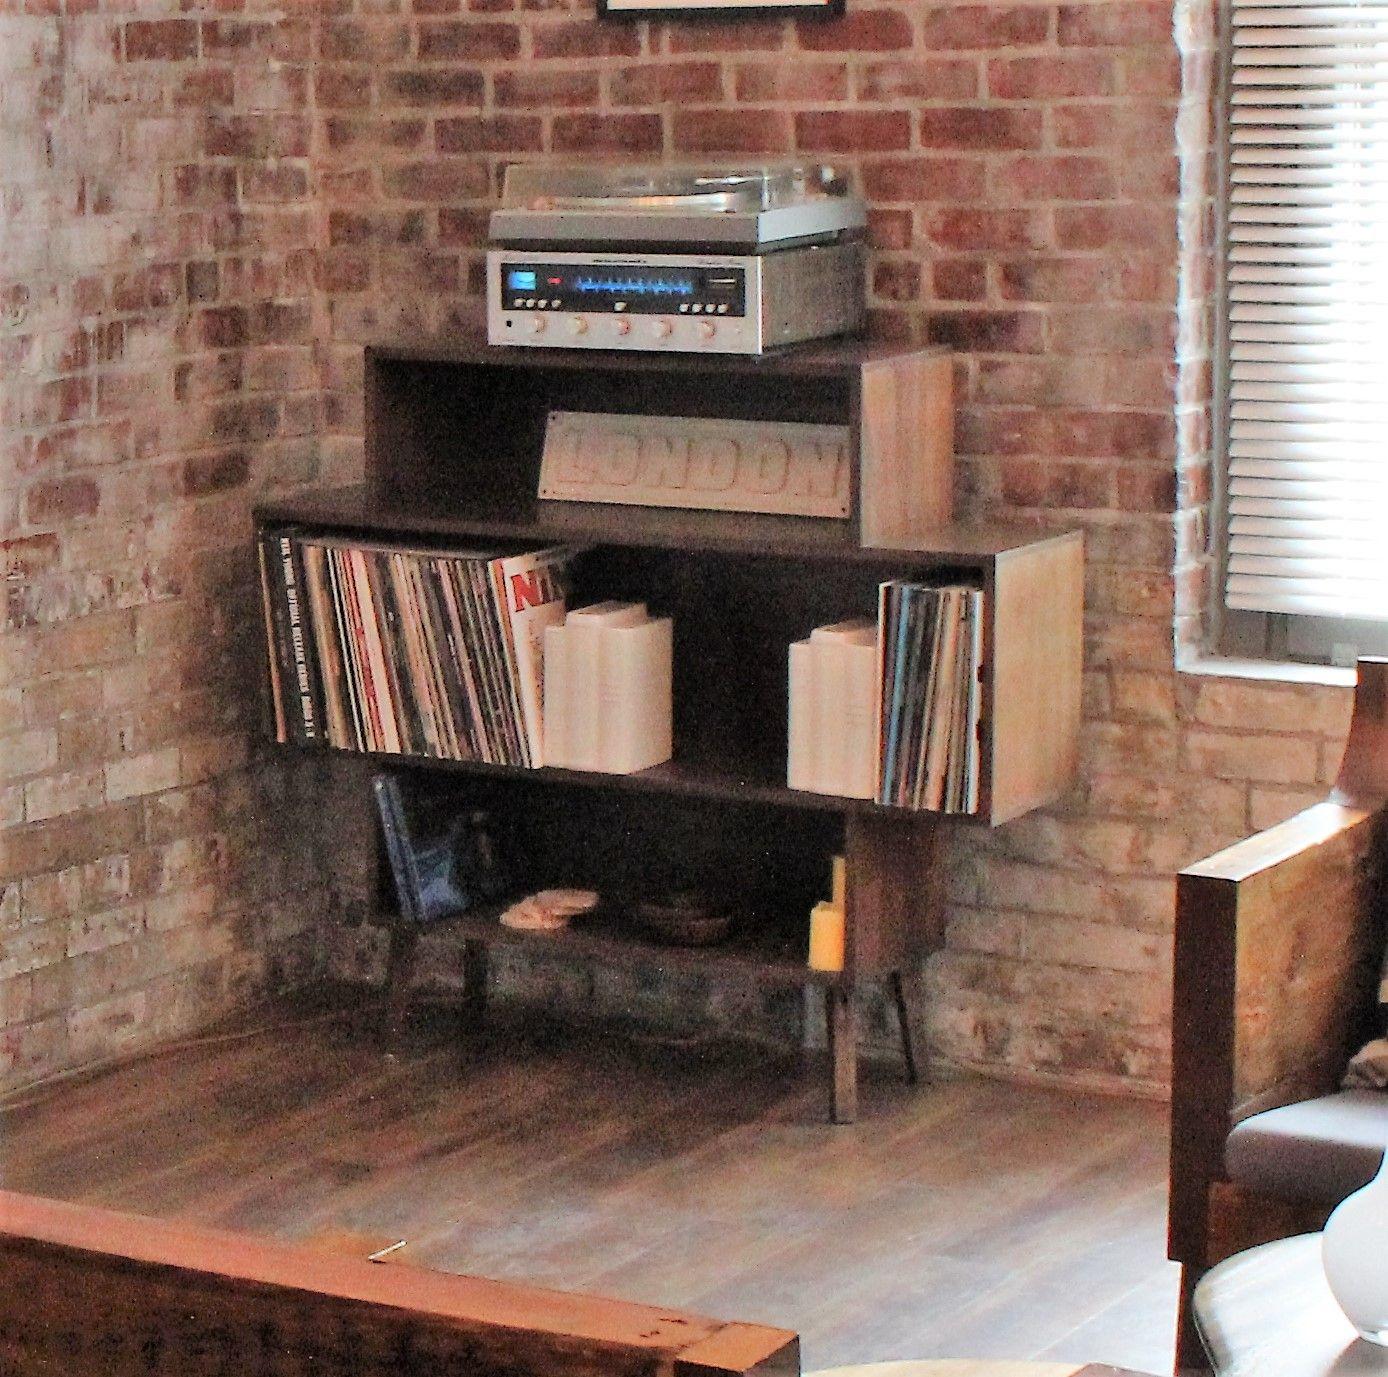 This elwoodus classic mid century modern shelf and vinyl bring us